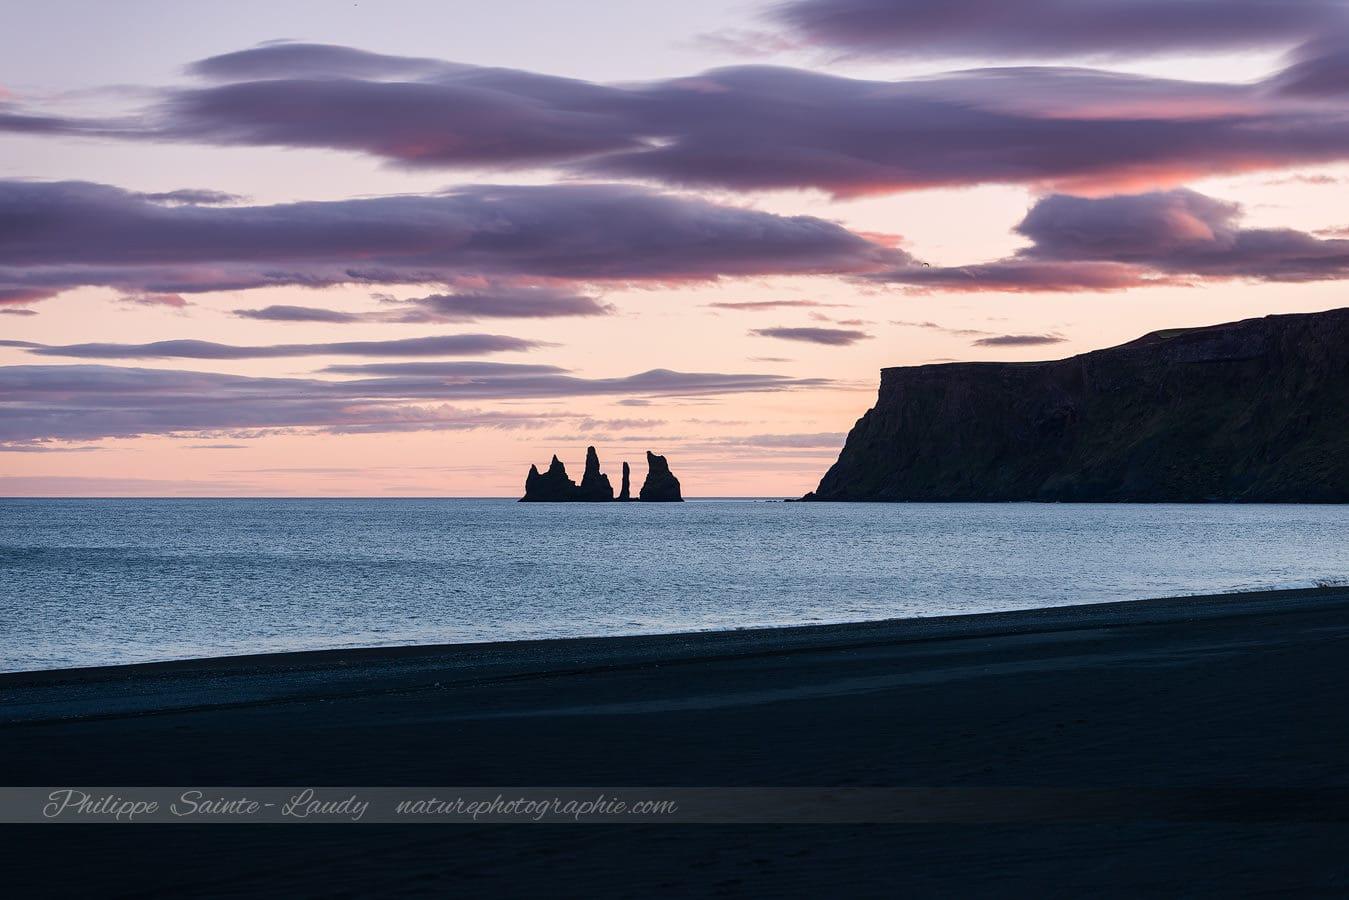 La plage de Vik en Islande avec les Reynisdrangar